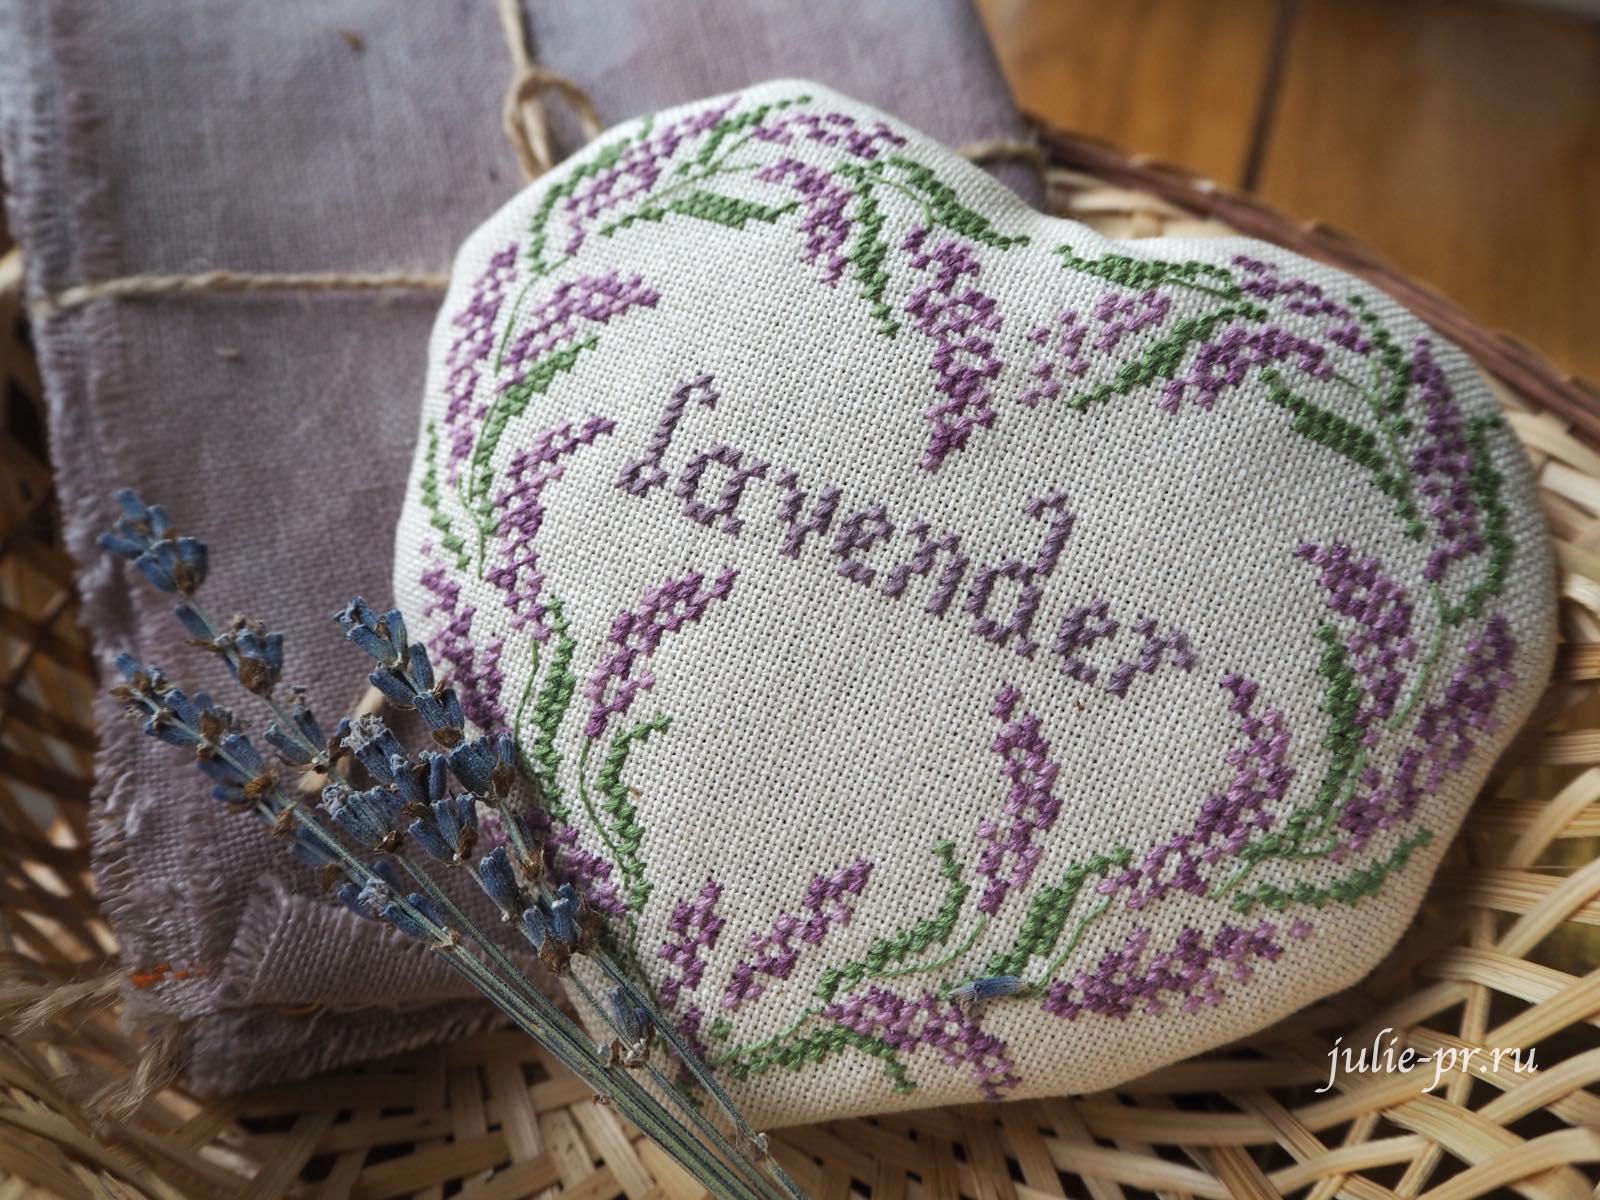 Cuore e Batticuore - Lavender Sampler, Лавандовый семплер, лаванда, вышивка крестом, лавандовое саше